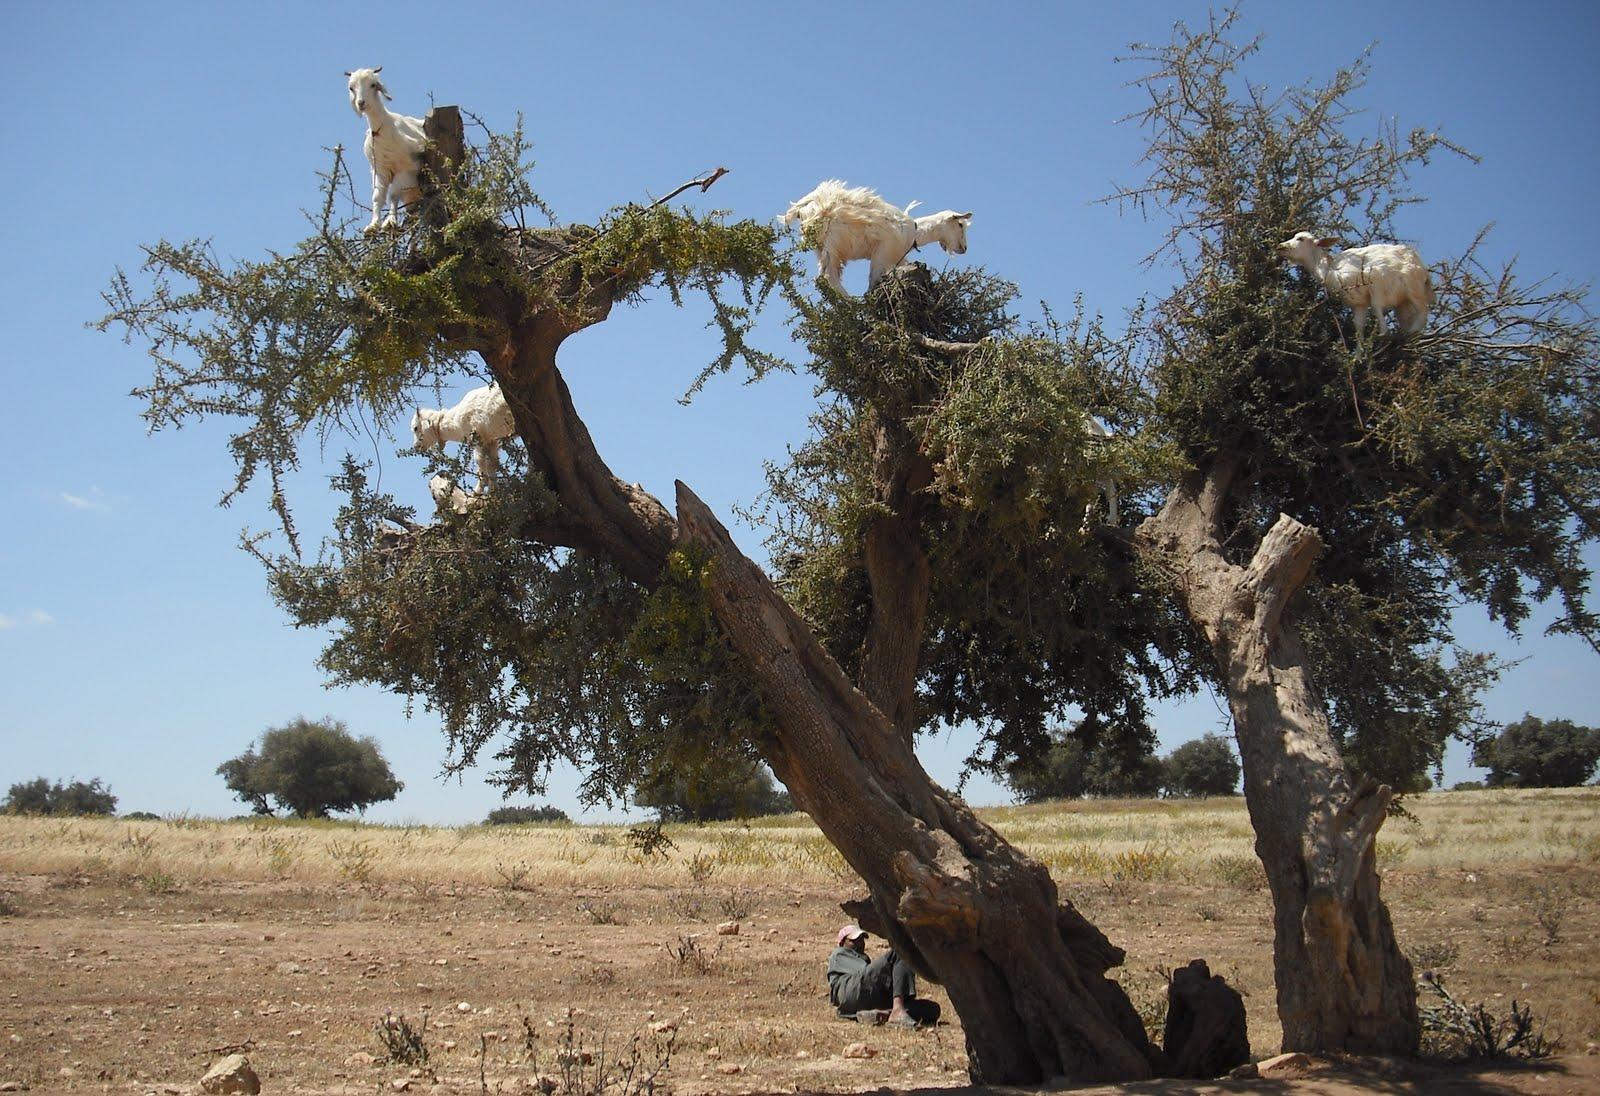 http://4.bp.blogspot.com/_vyC1EvBoZeY/TAEuX1jN5oI/AAAAAAAAAYg/r3jpJE1eeYo/s1600/900+goats+in+trees.jpg